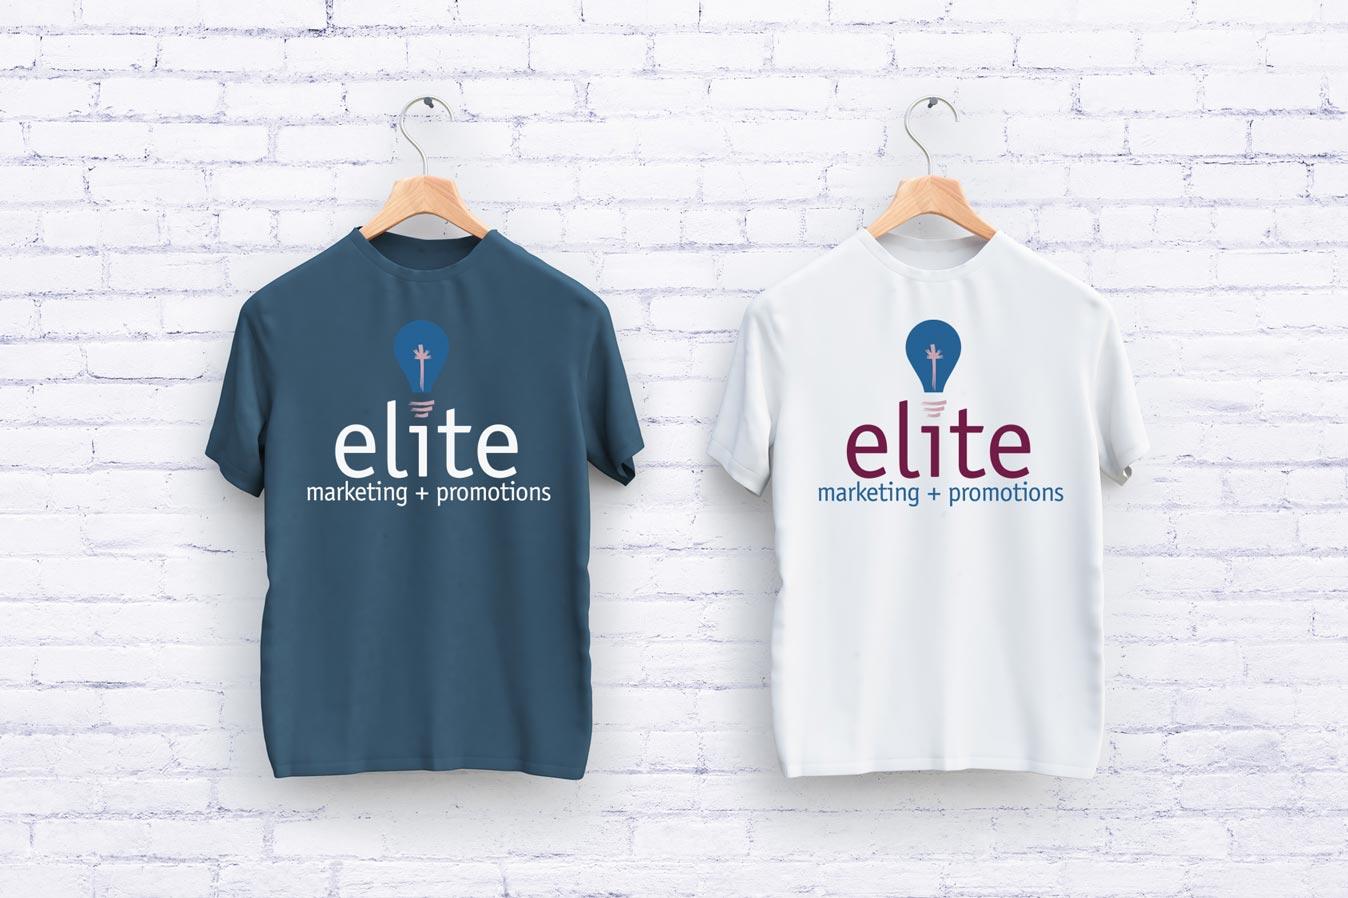 Elite Marketing + Promotions Branded Apparel